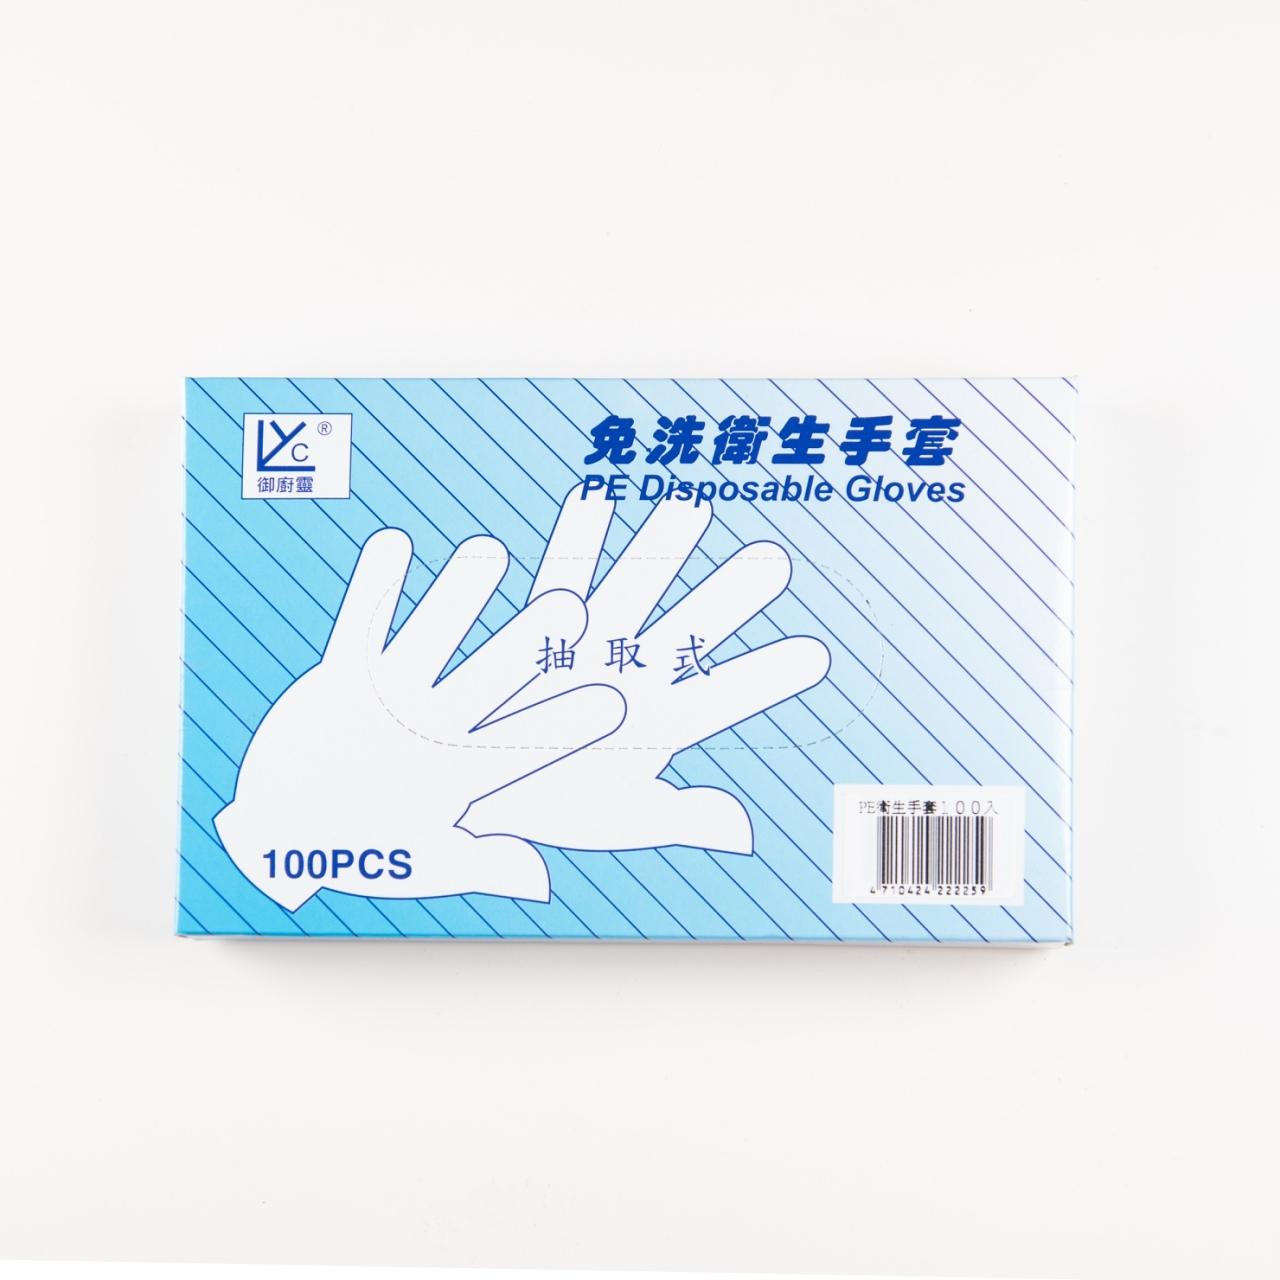 Qmishop PE衛生手套100入J417